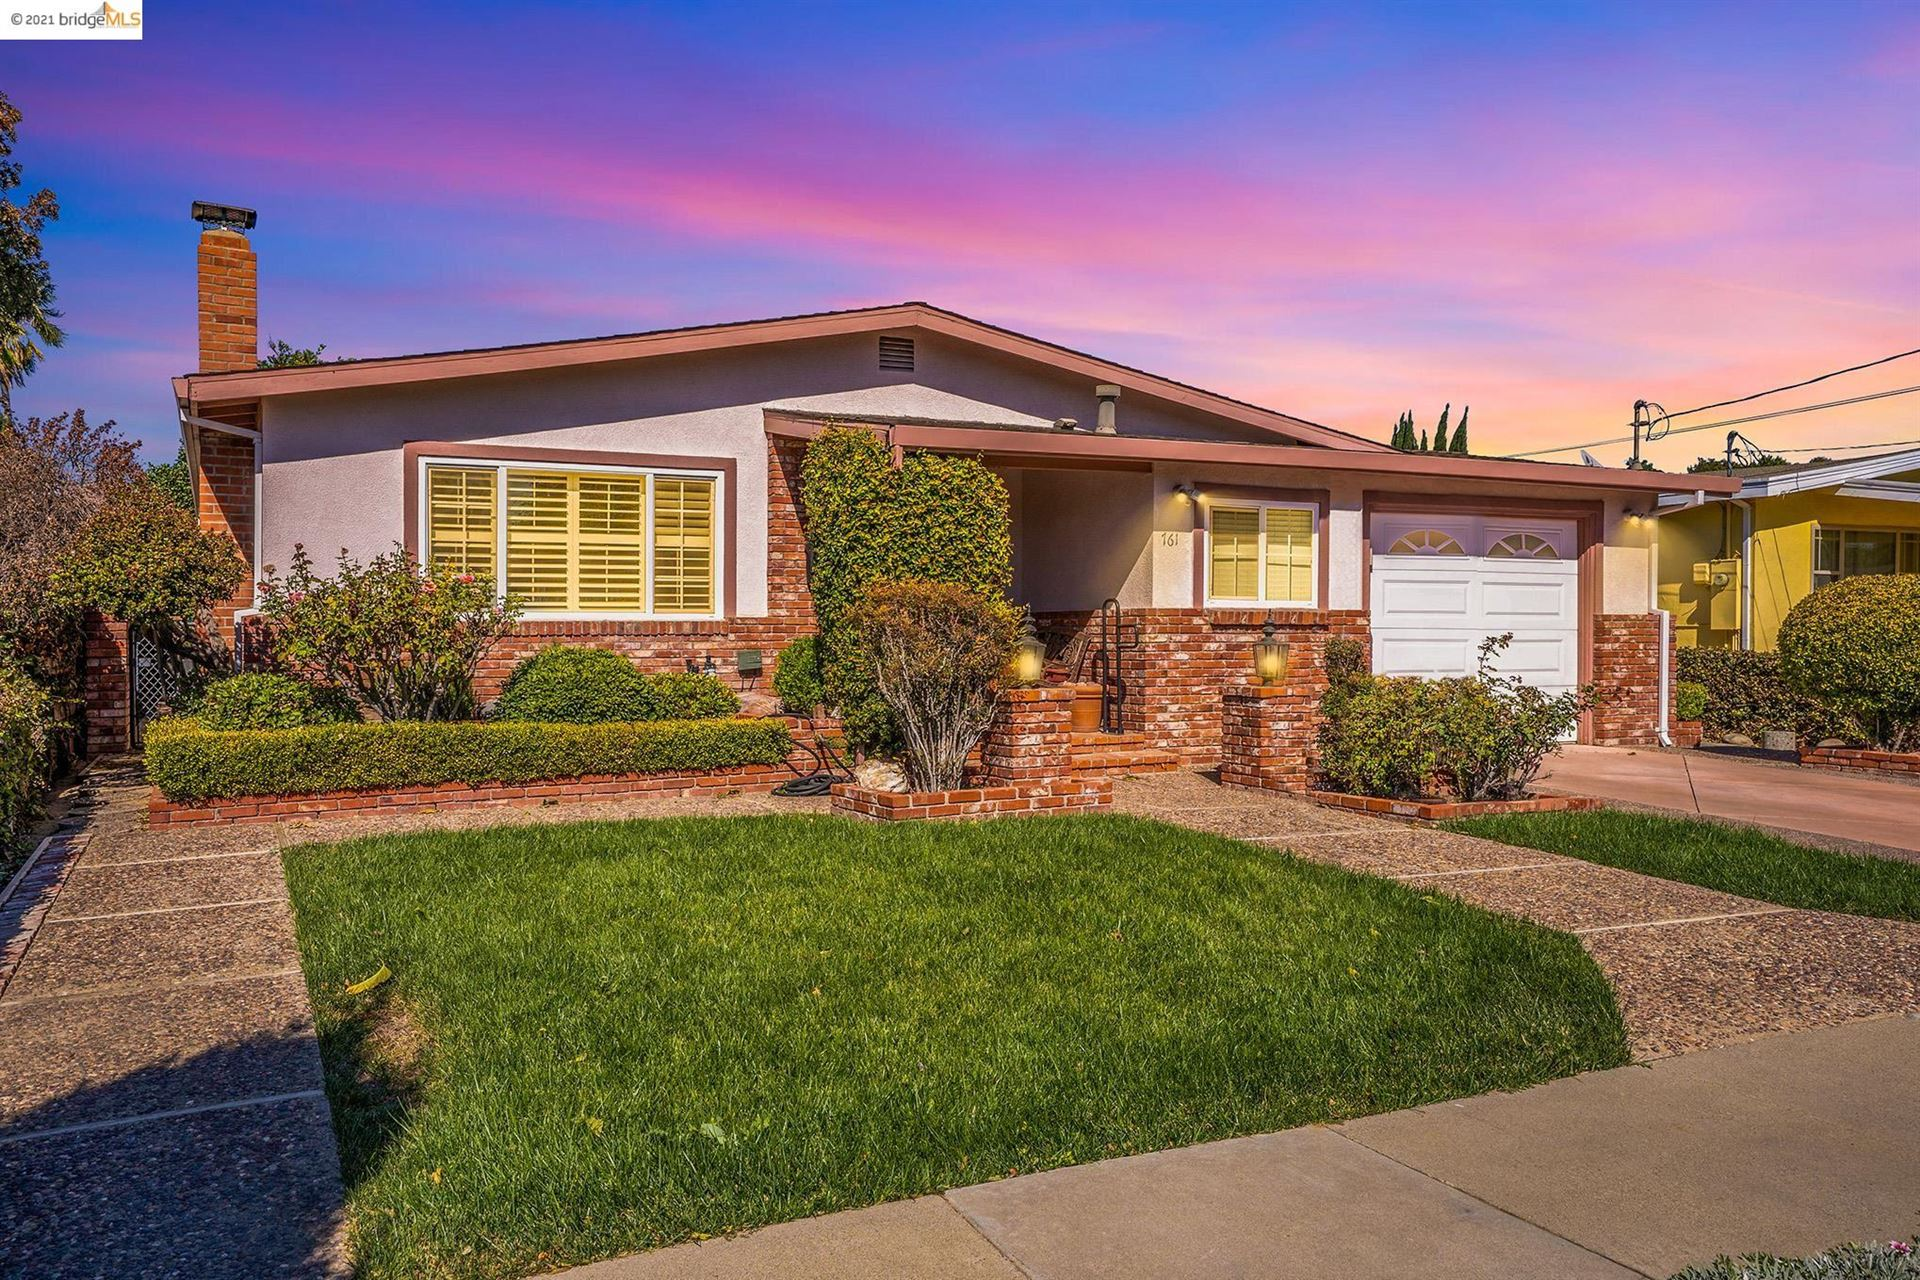 Photo of 761 Oak St, Brentwood, CA 94513 (MLS # 40970823)